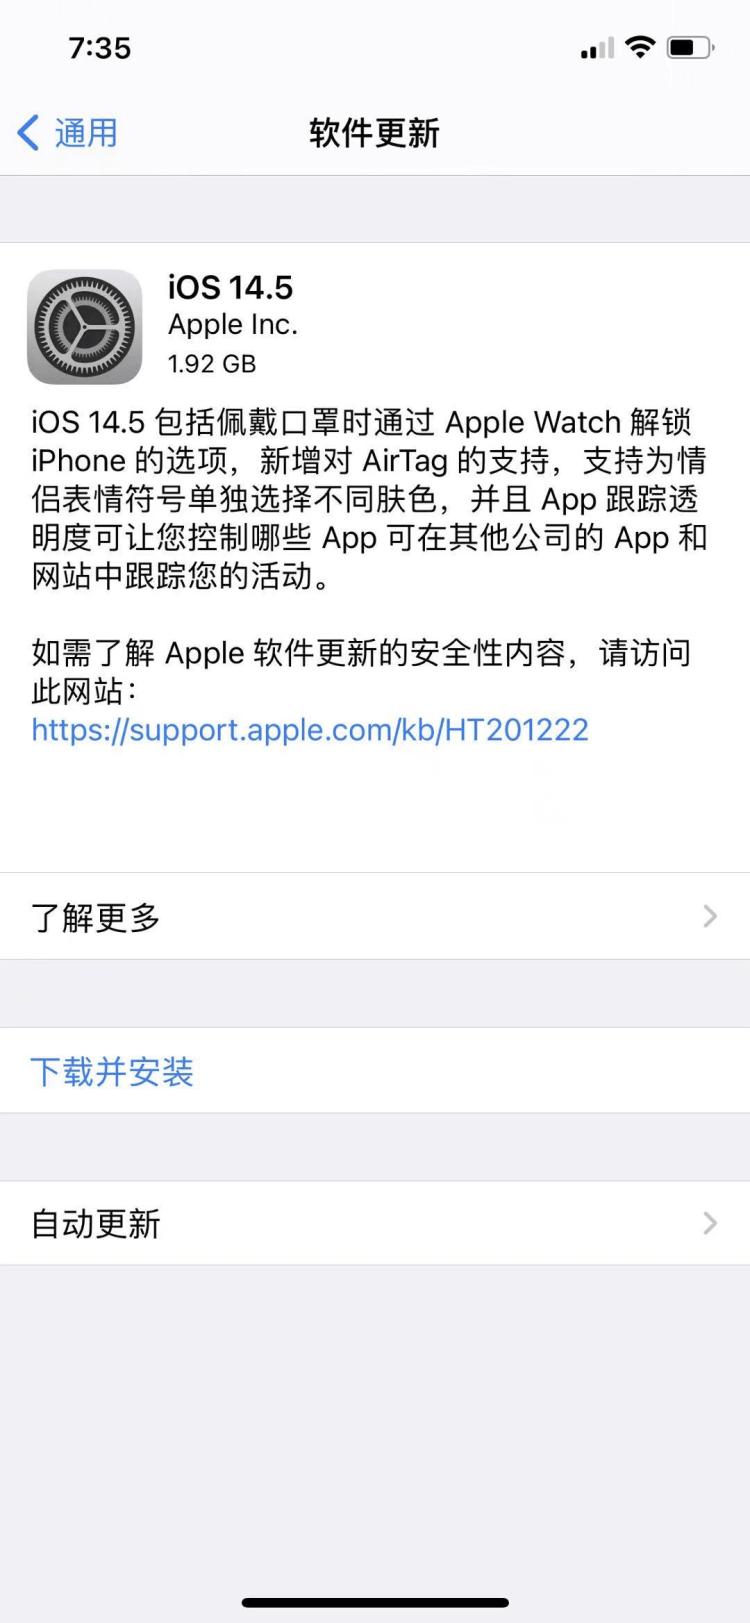 【PW热点】苹果正式推送iOS 14.5:可通过AppleWatch解锁iPhone